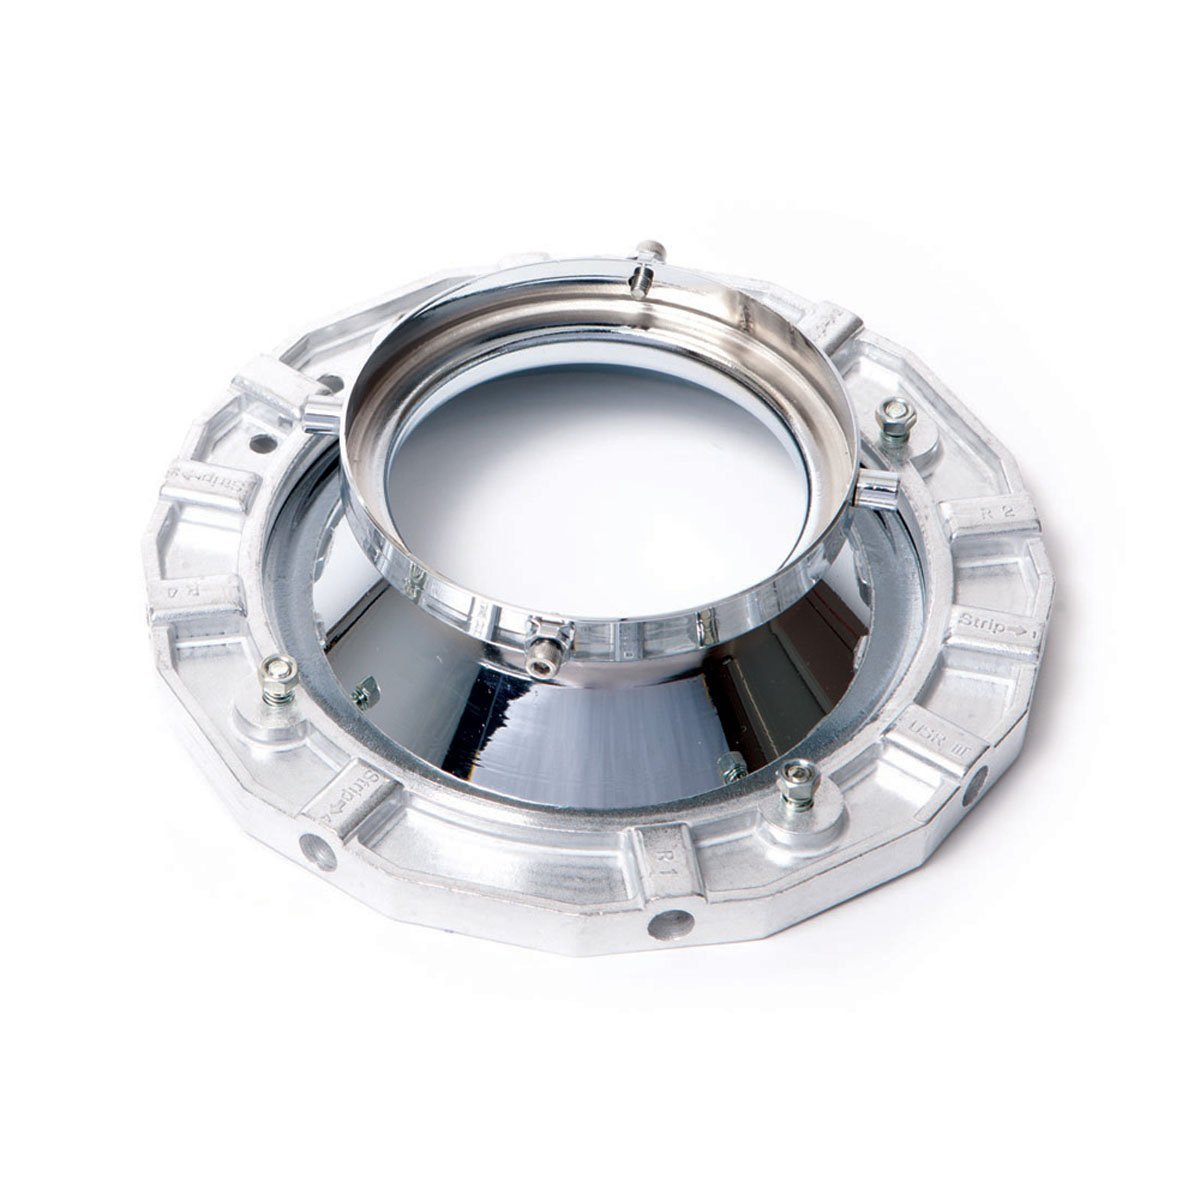 Westcott 3503 Adapter Ring for Norman LH - 500, 500B, 500 PLUS, 500B PLUS, 2000, 2400, 2400B, 4000, Norlite Monostrobe Series (Black) by Westcott